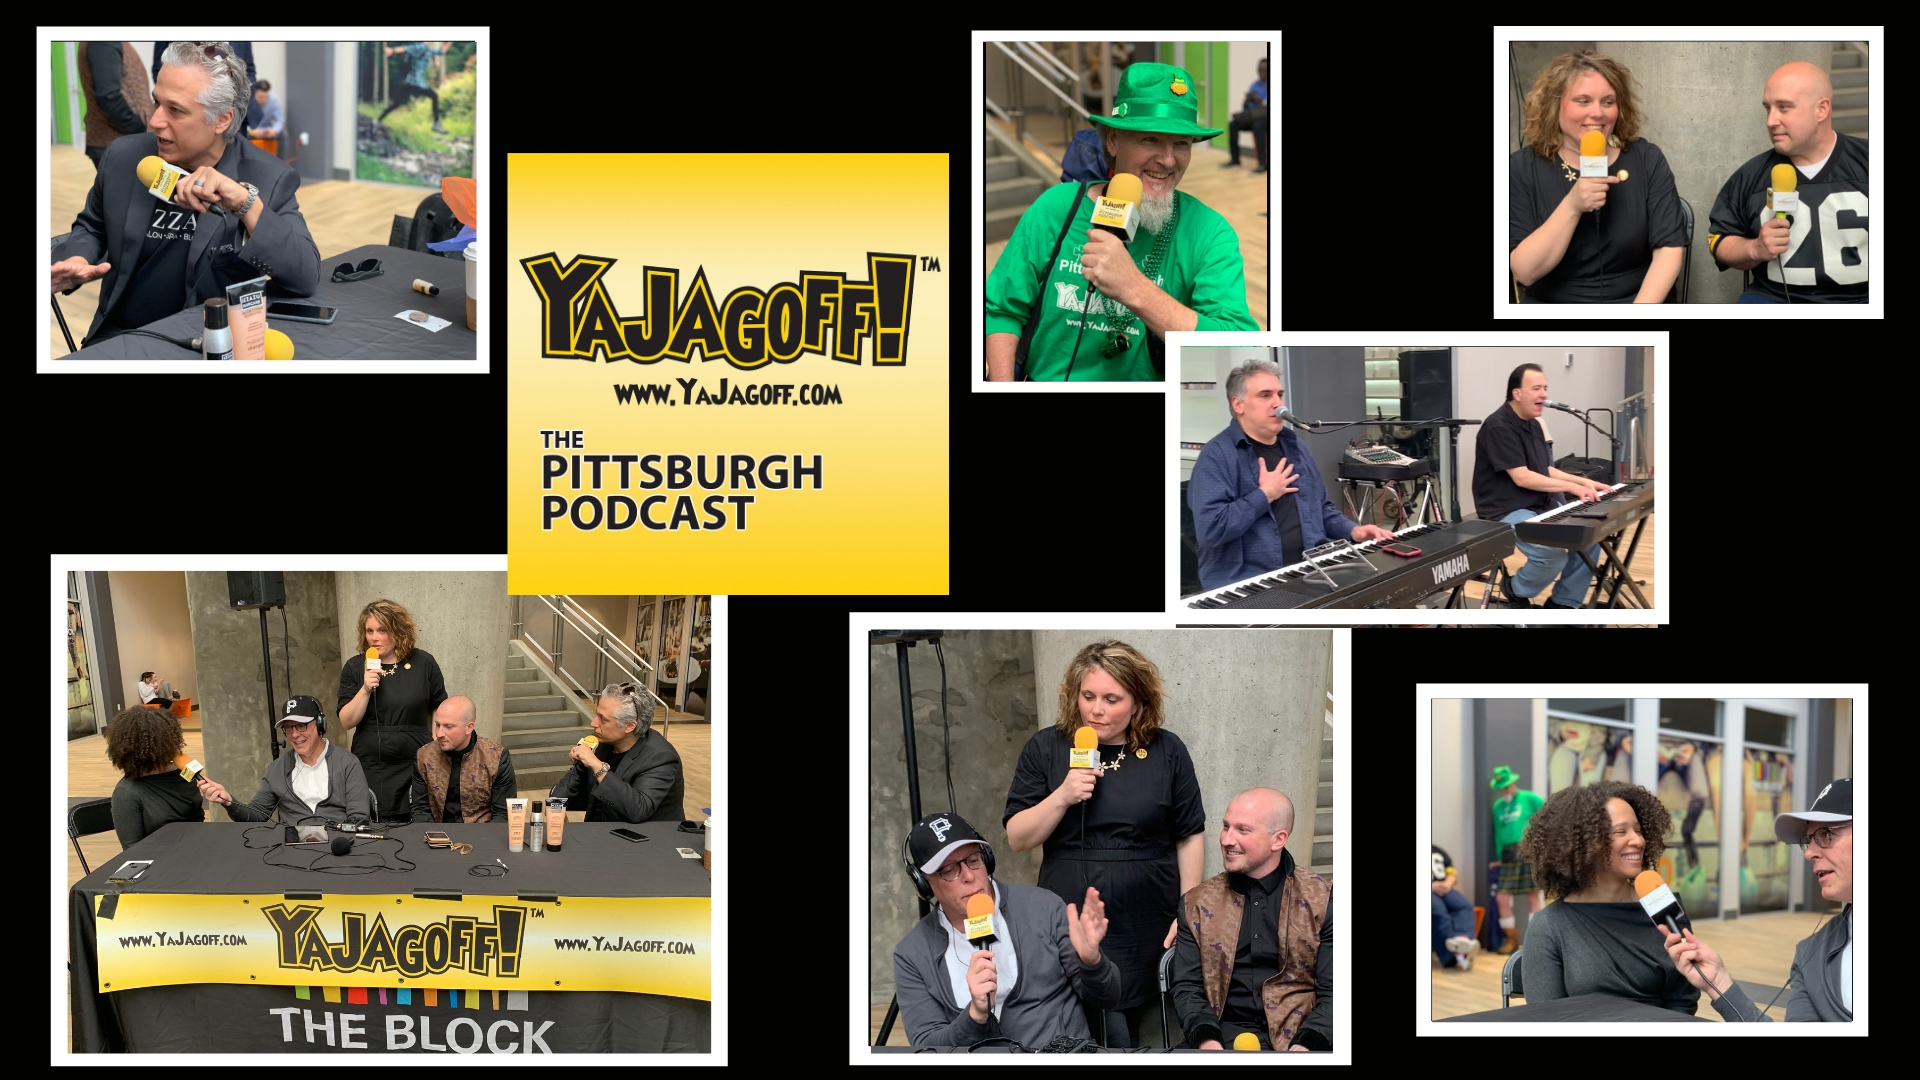 YaJagoff Podcast Fashion Show